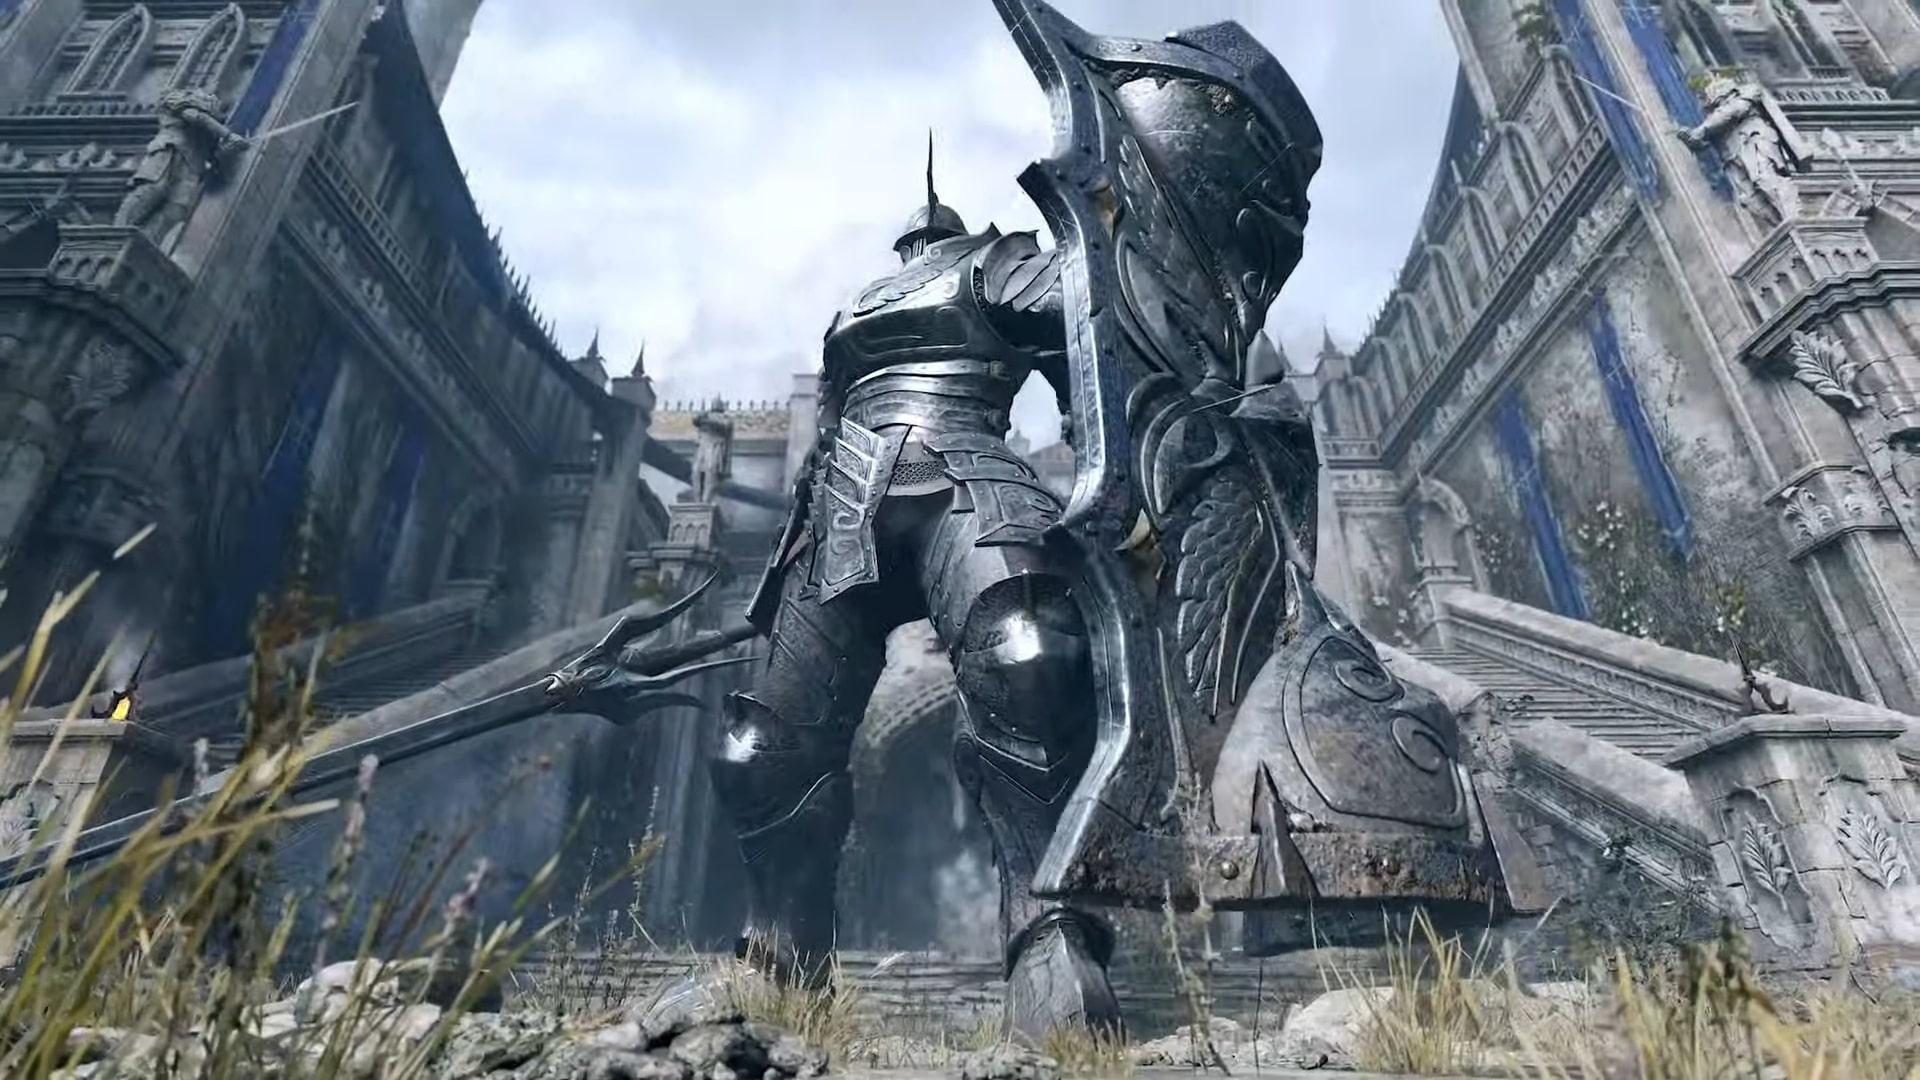 Demon's Souls remake announced for PS5   GamesRadar+